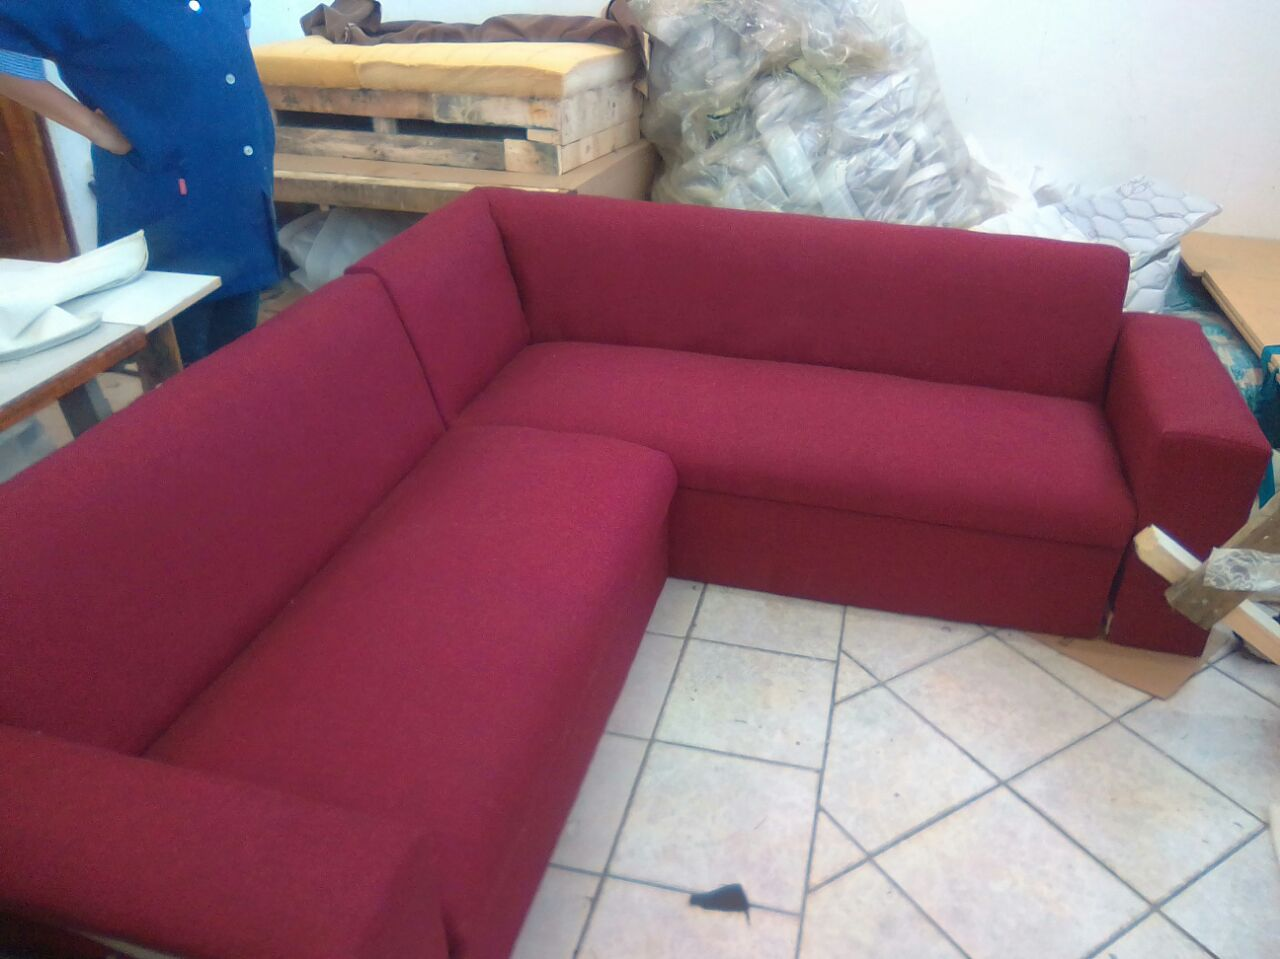 urgent sale! new red sofa